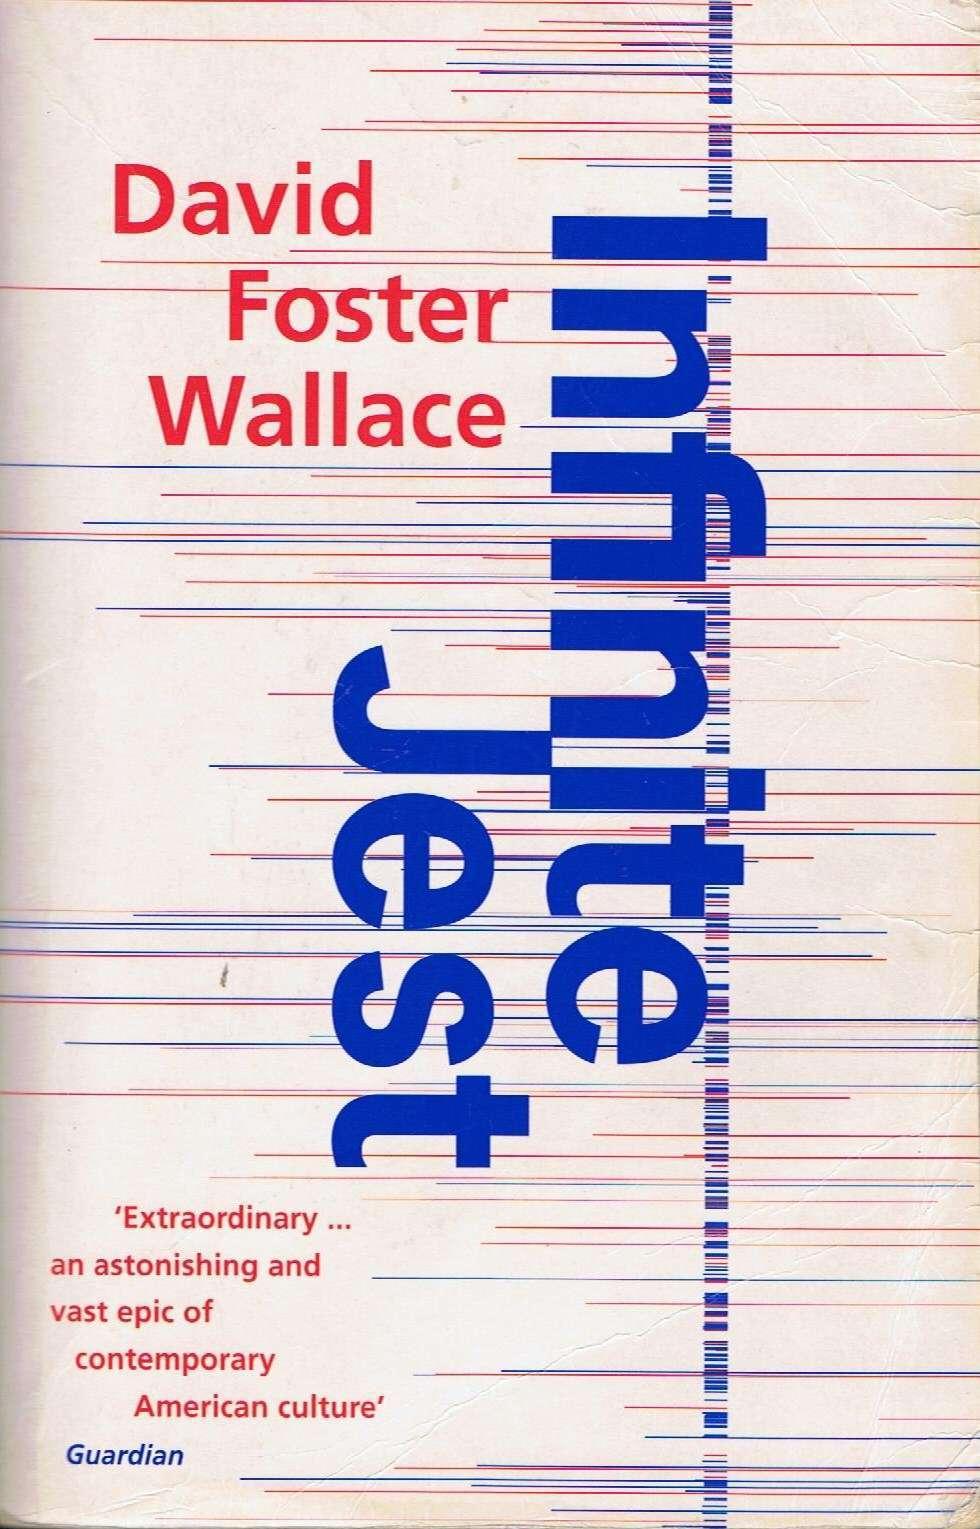 'Infinite Jest' - David Foster Wallace